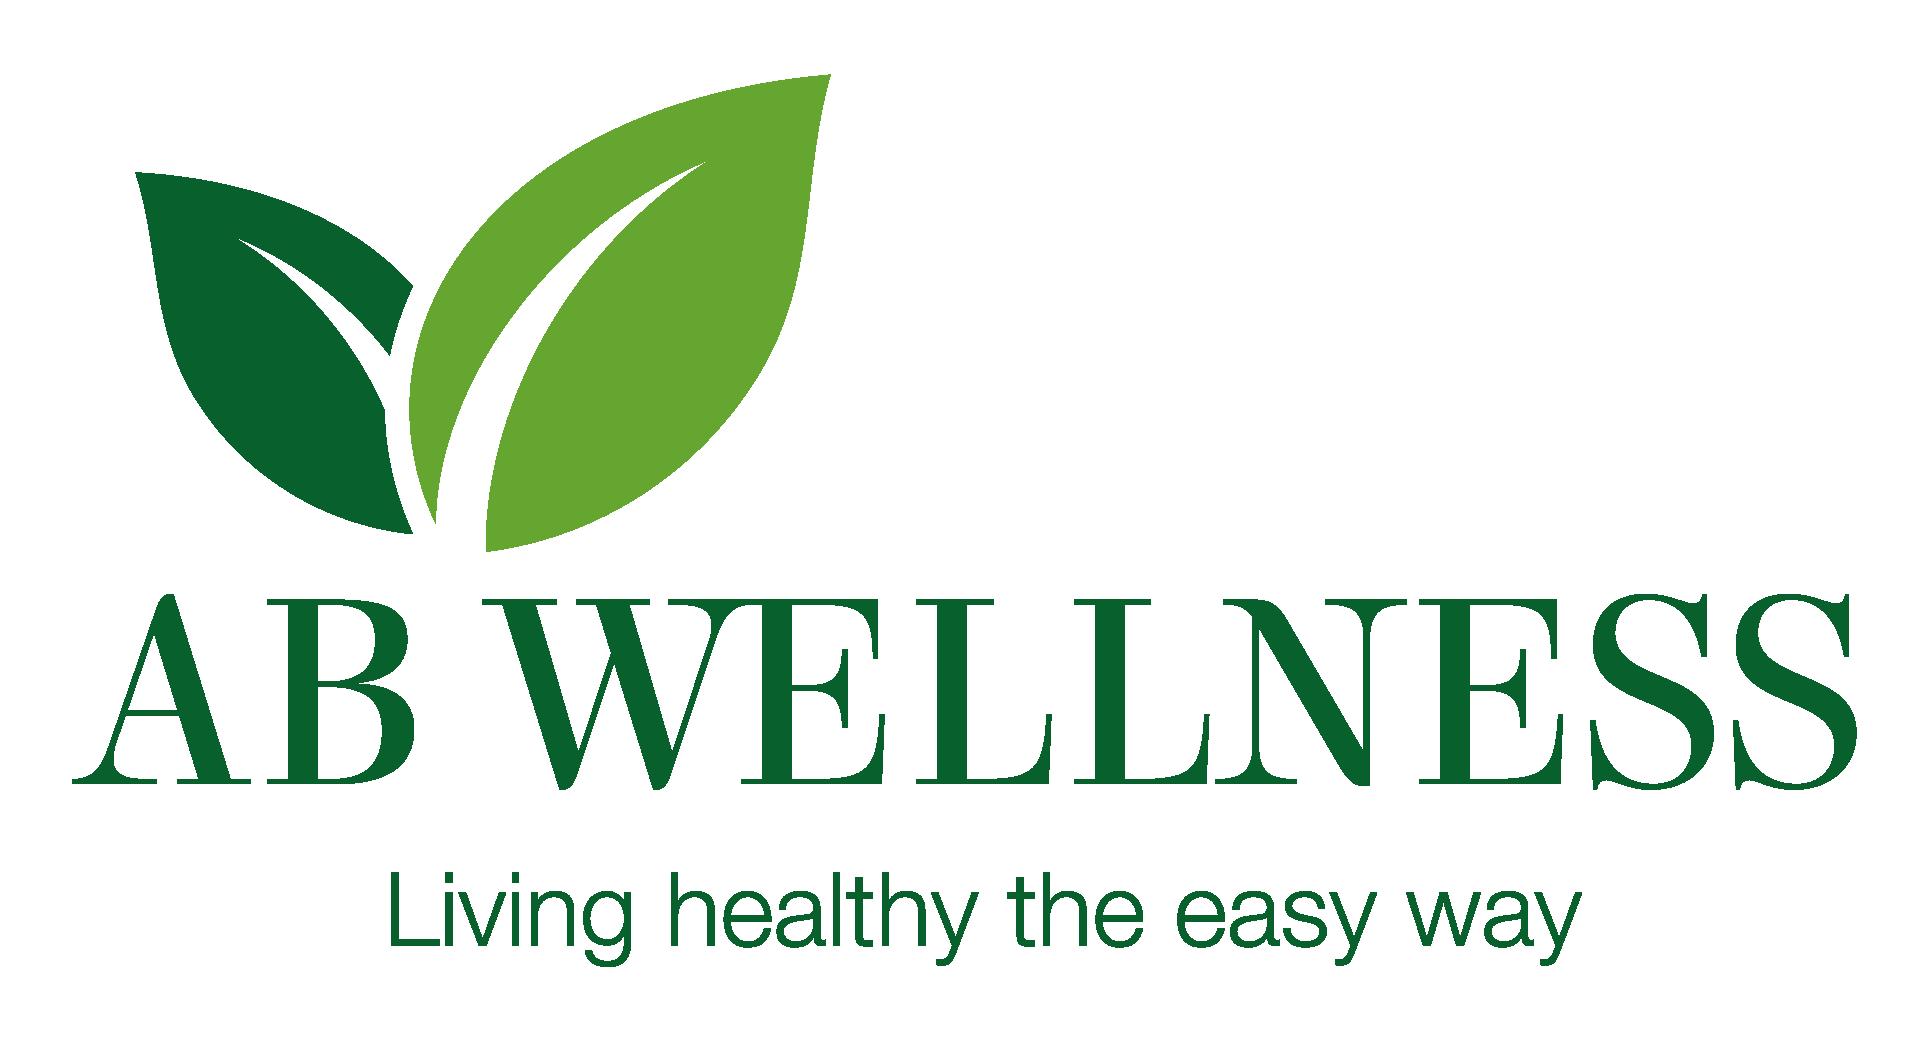 Ab wellness logo